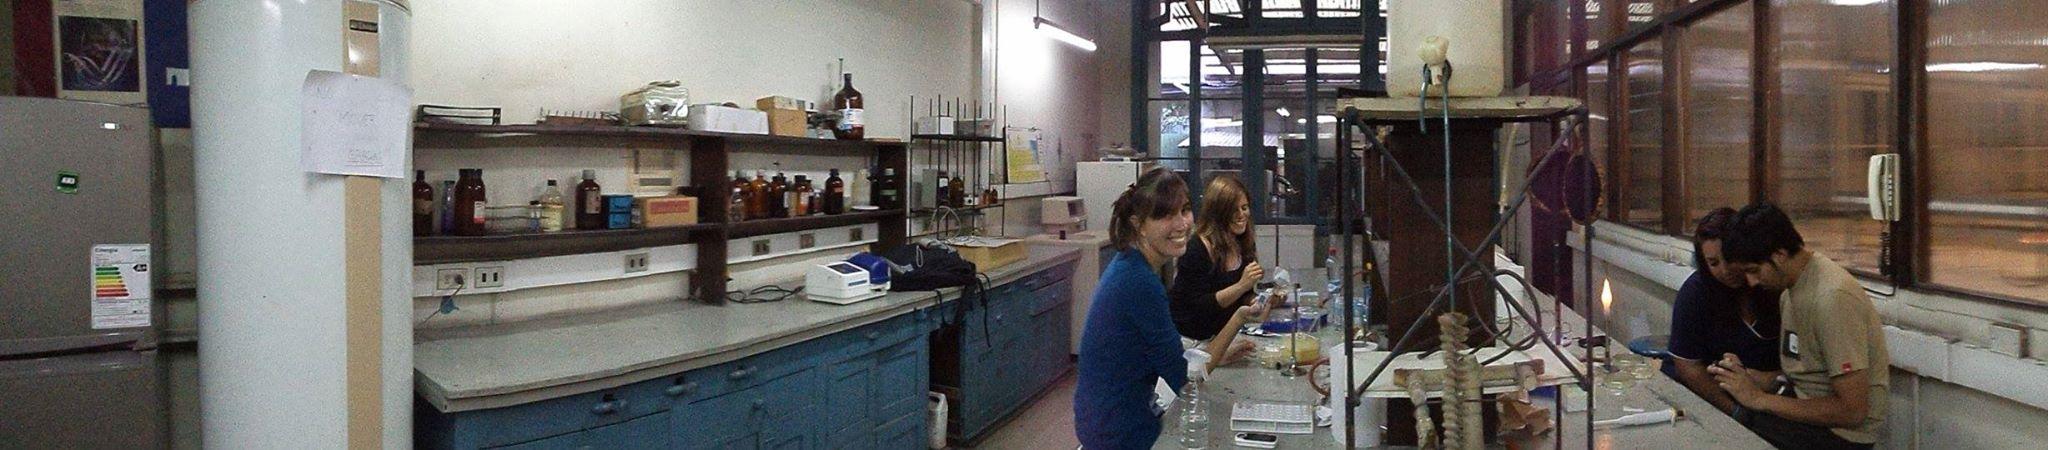 procesando muestras de ventana Lab Uchile